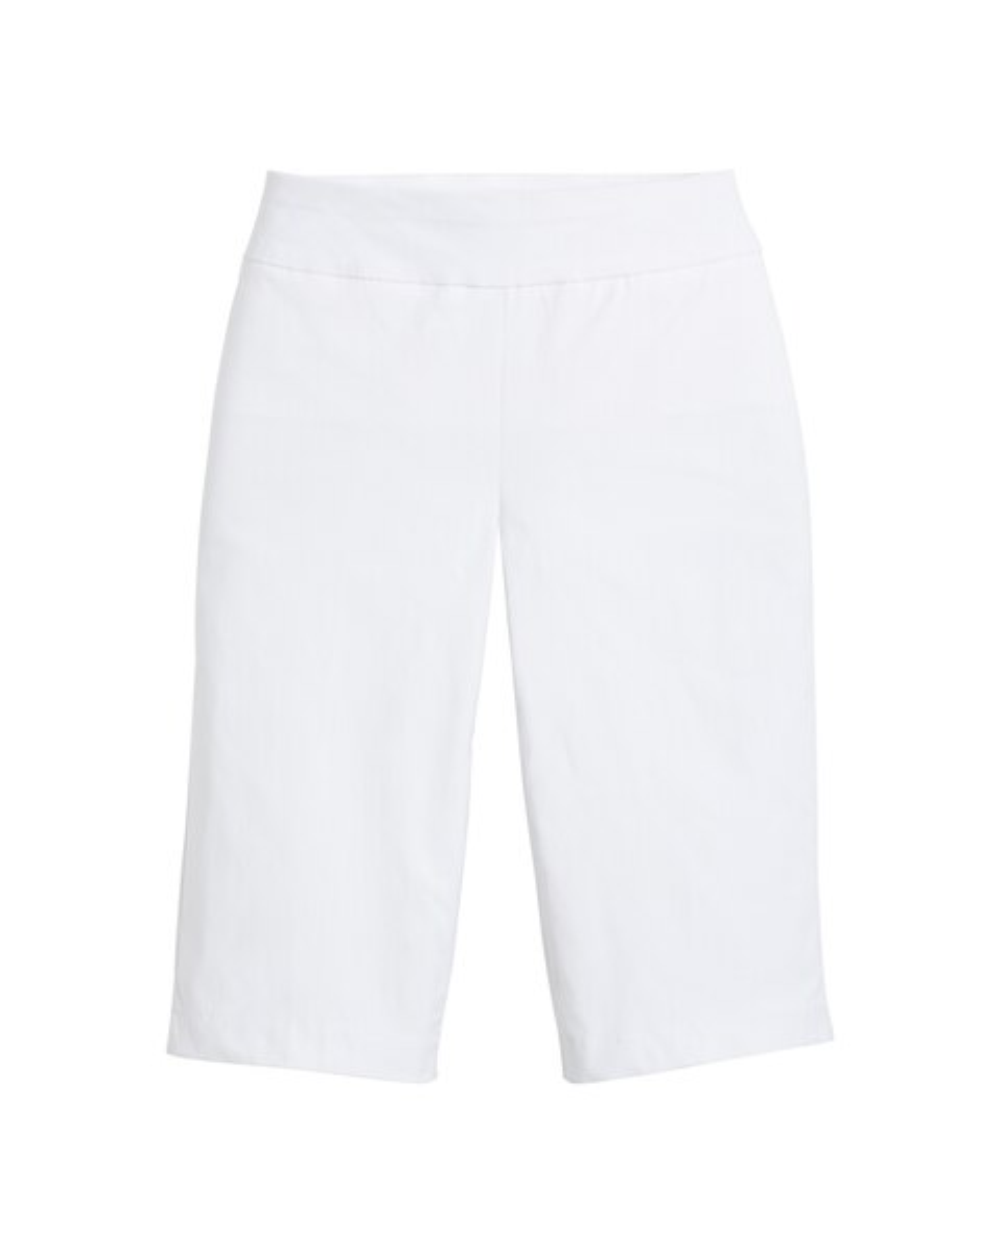 Chicco Pantaloncini Short B/éb/é gar/çon